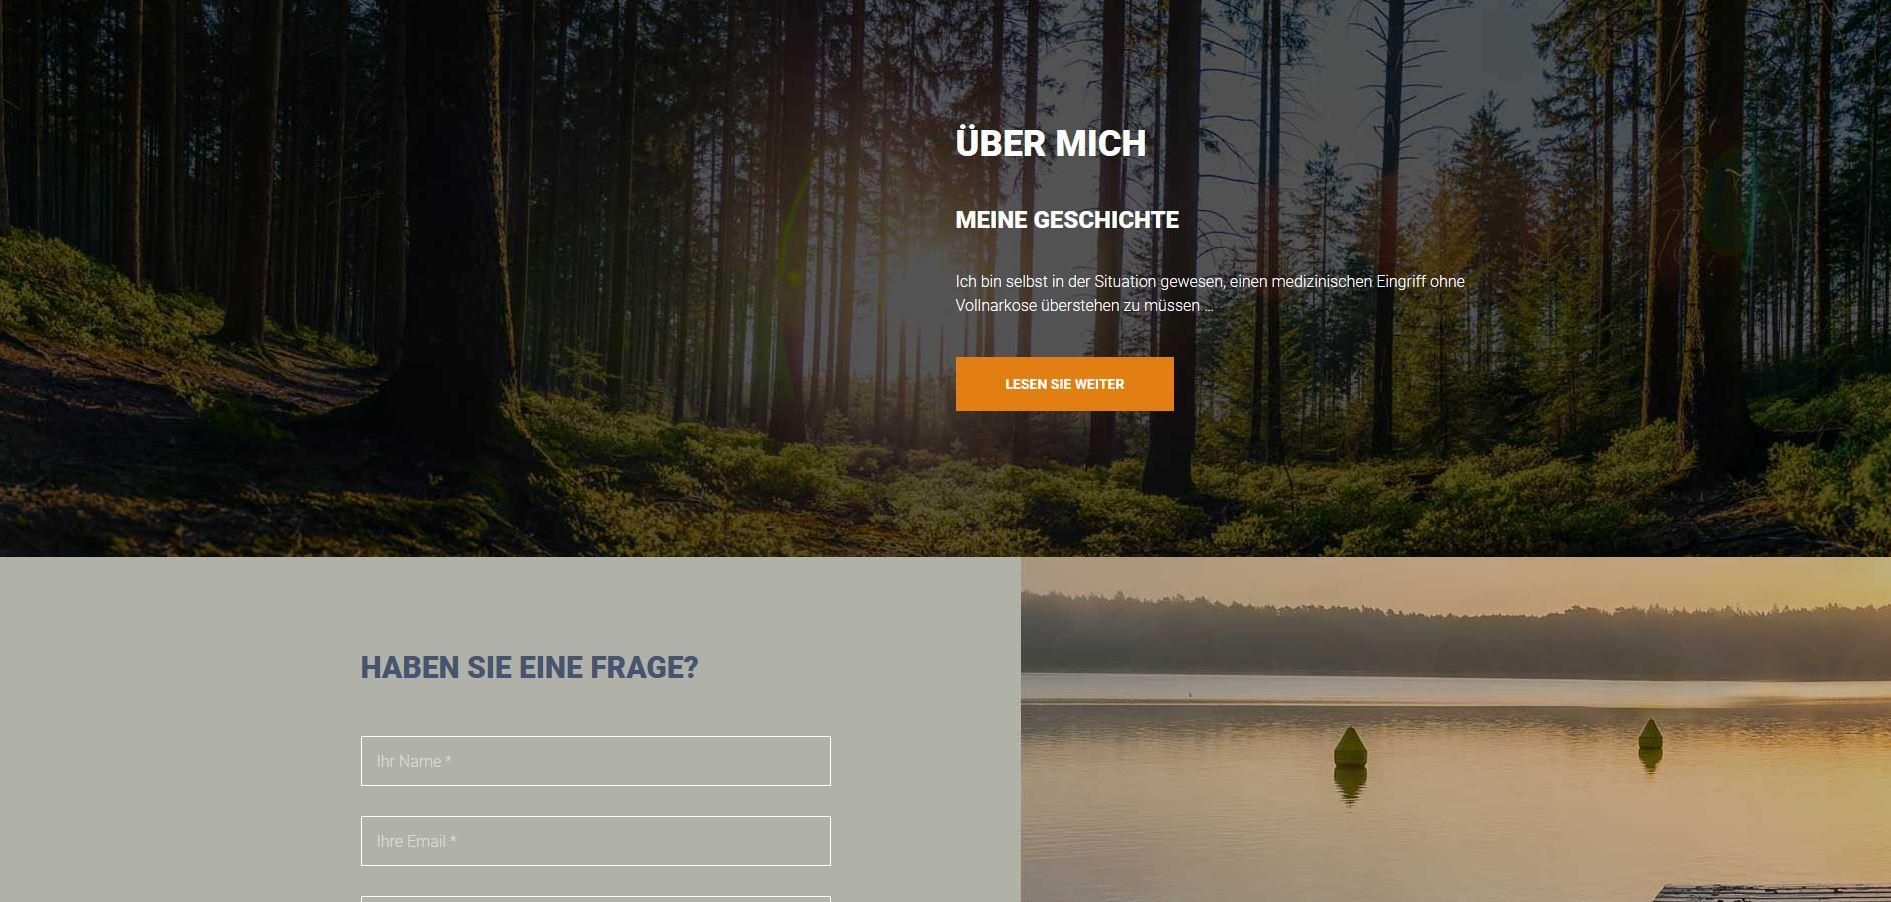 heidi-peter.ch